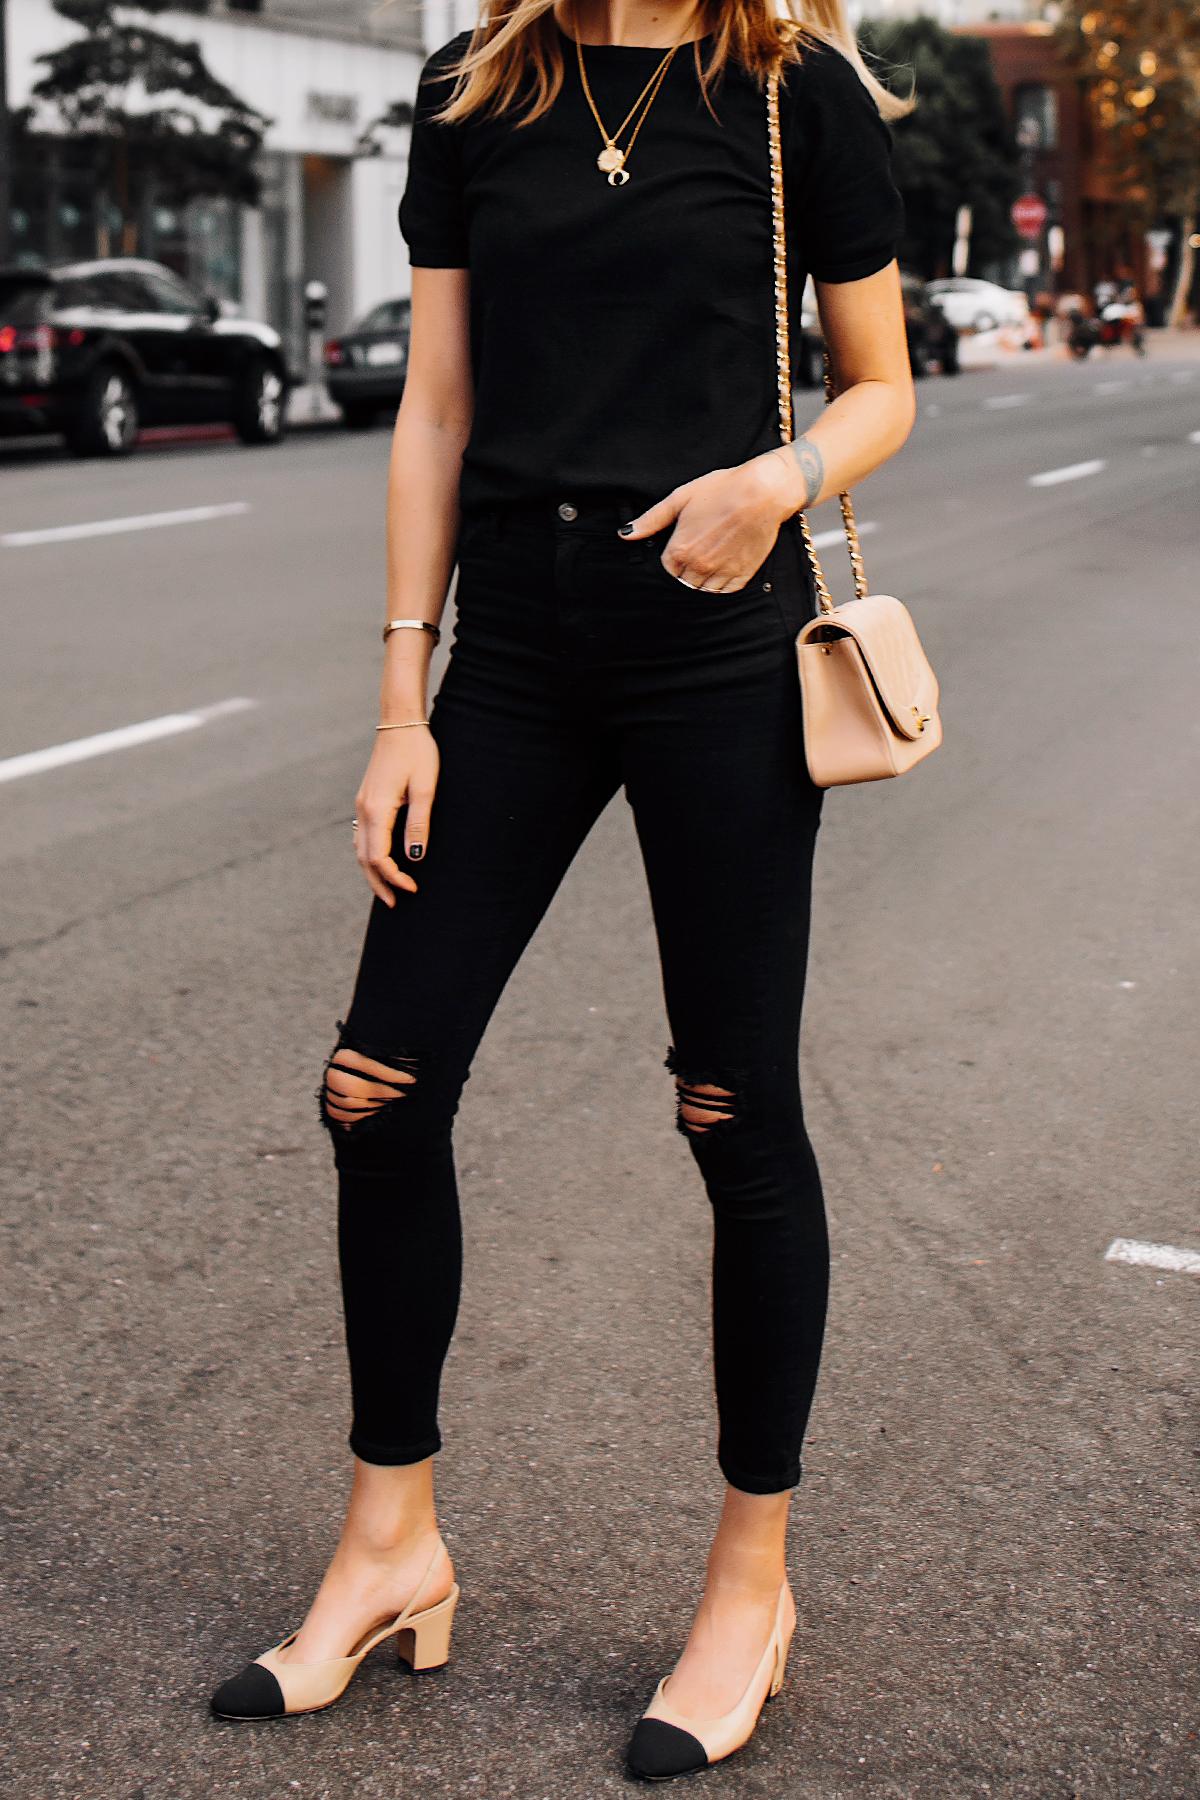 Woman Wearing Black Short Sleeve Top Black Ripped Skinny Jeans Chanel Diana Tan Handbag Chanel Slingback Shoes Fashion Jackson San Diego Fashion Blogger Street Style